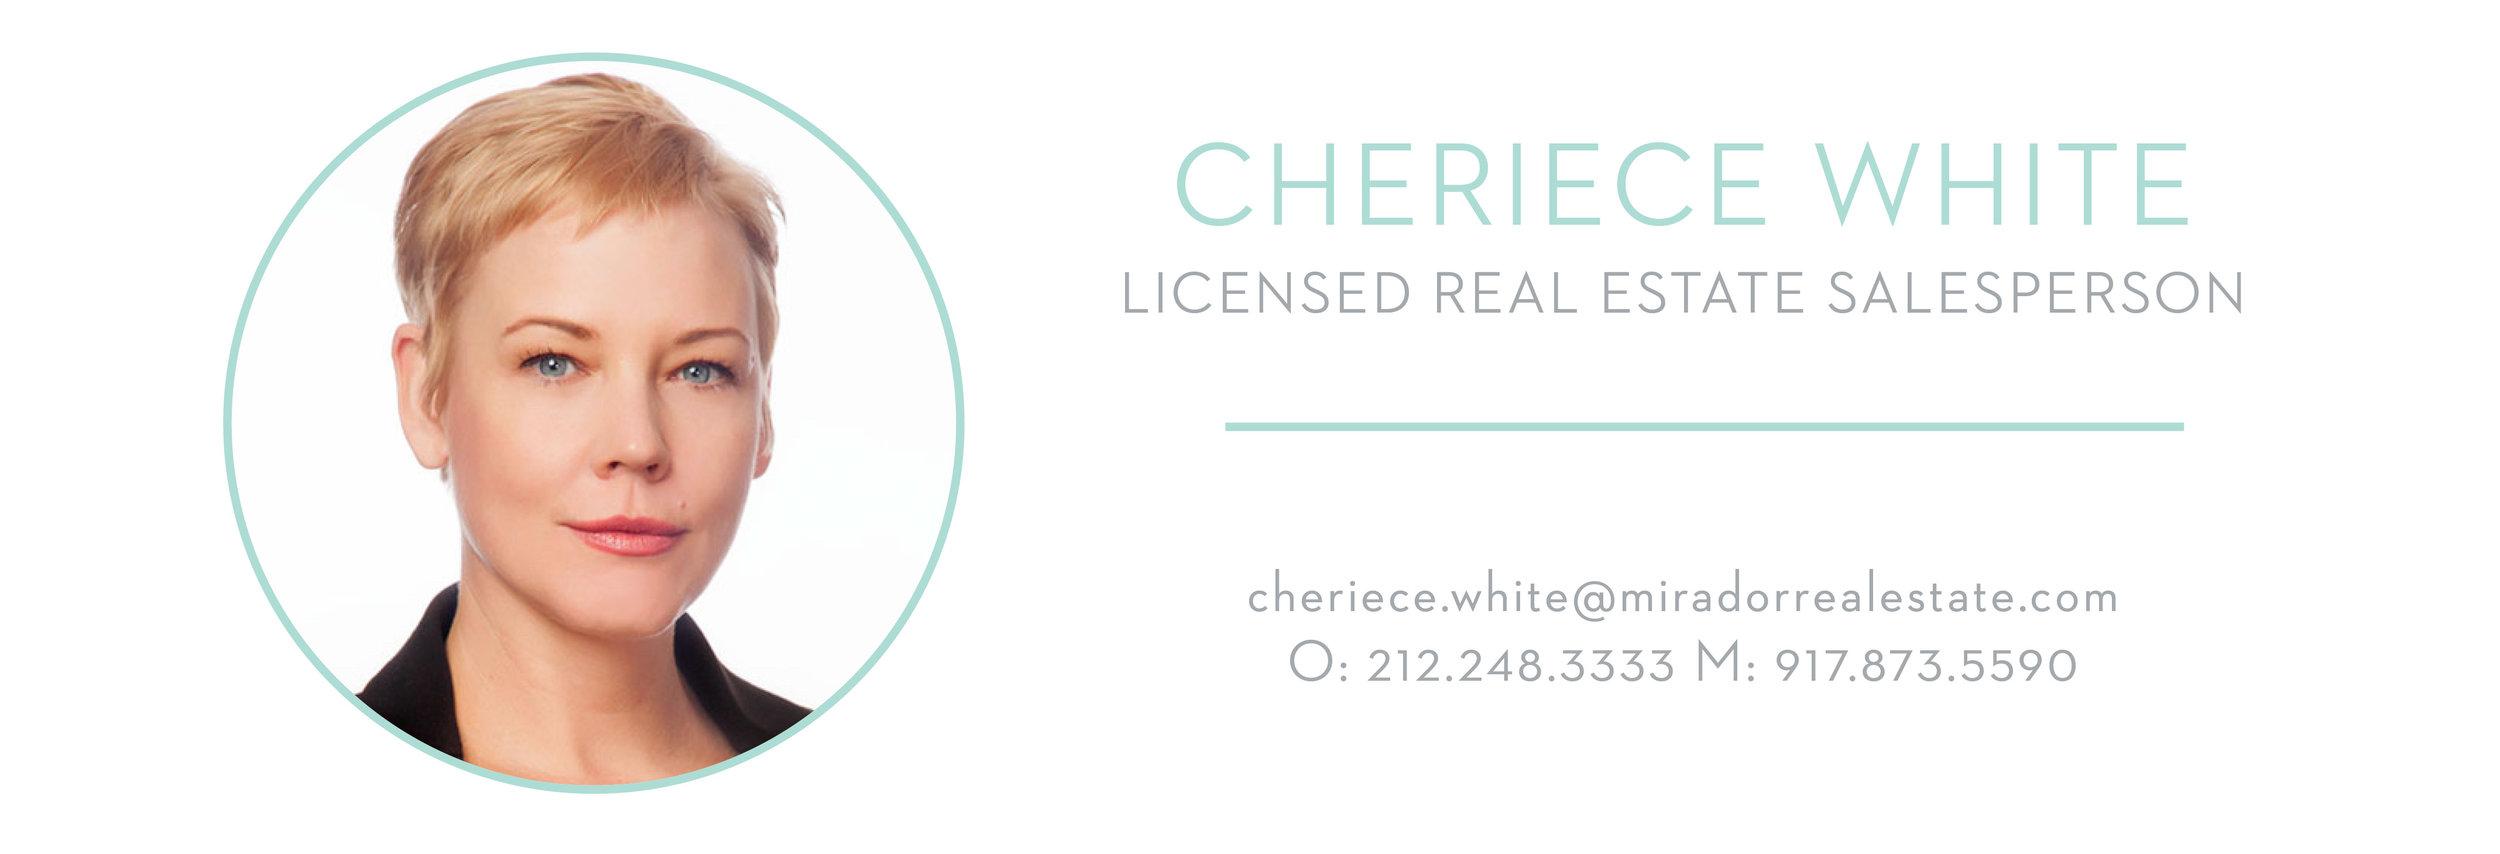 Cheriece White